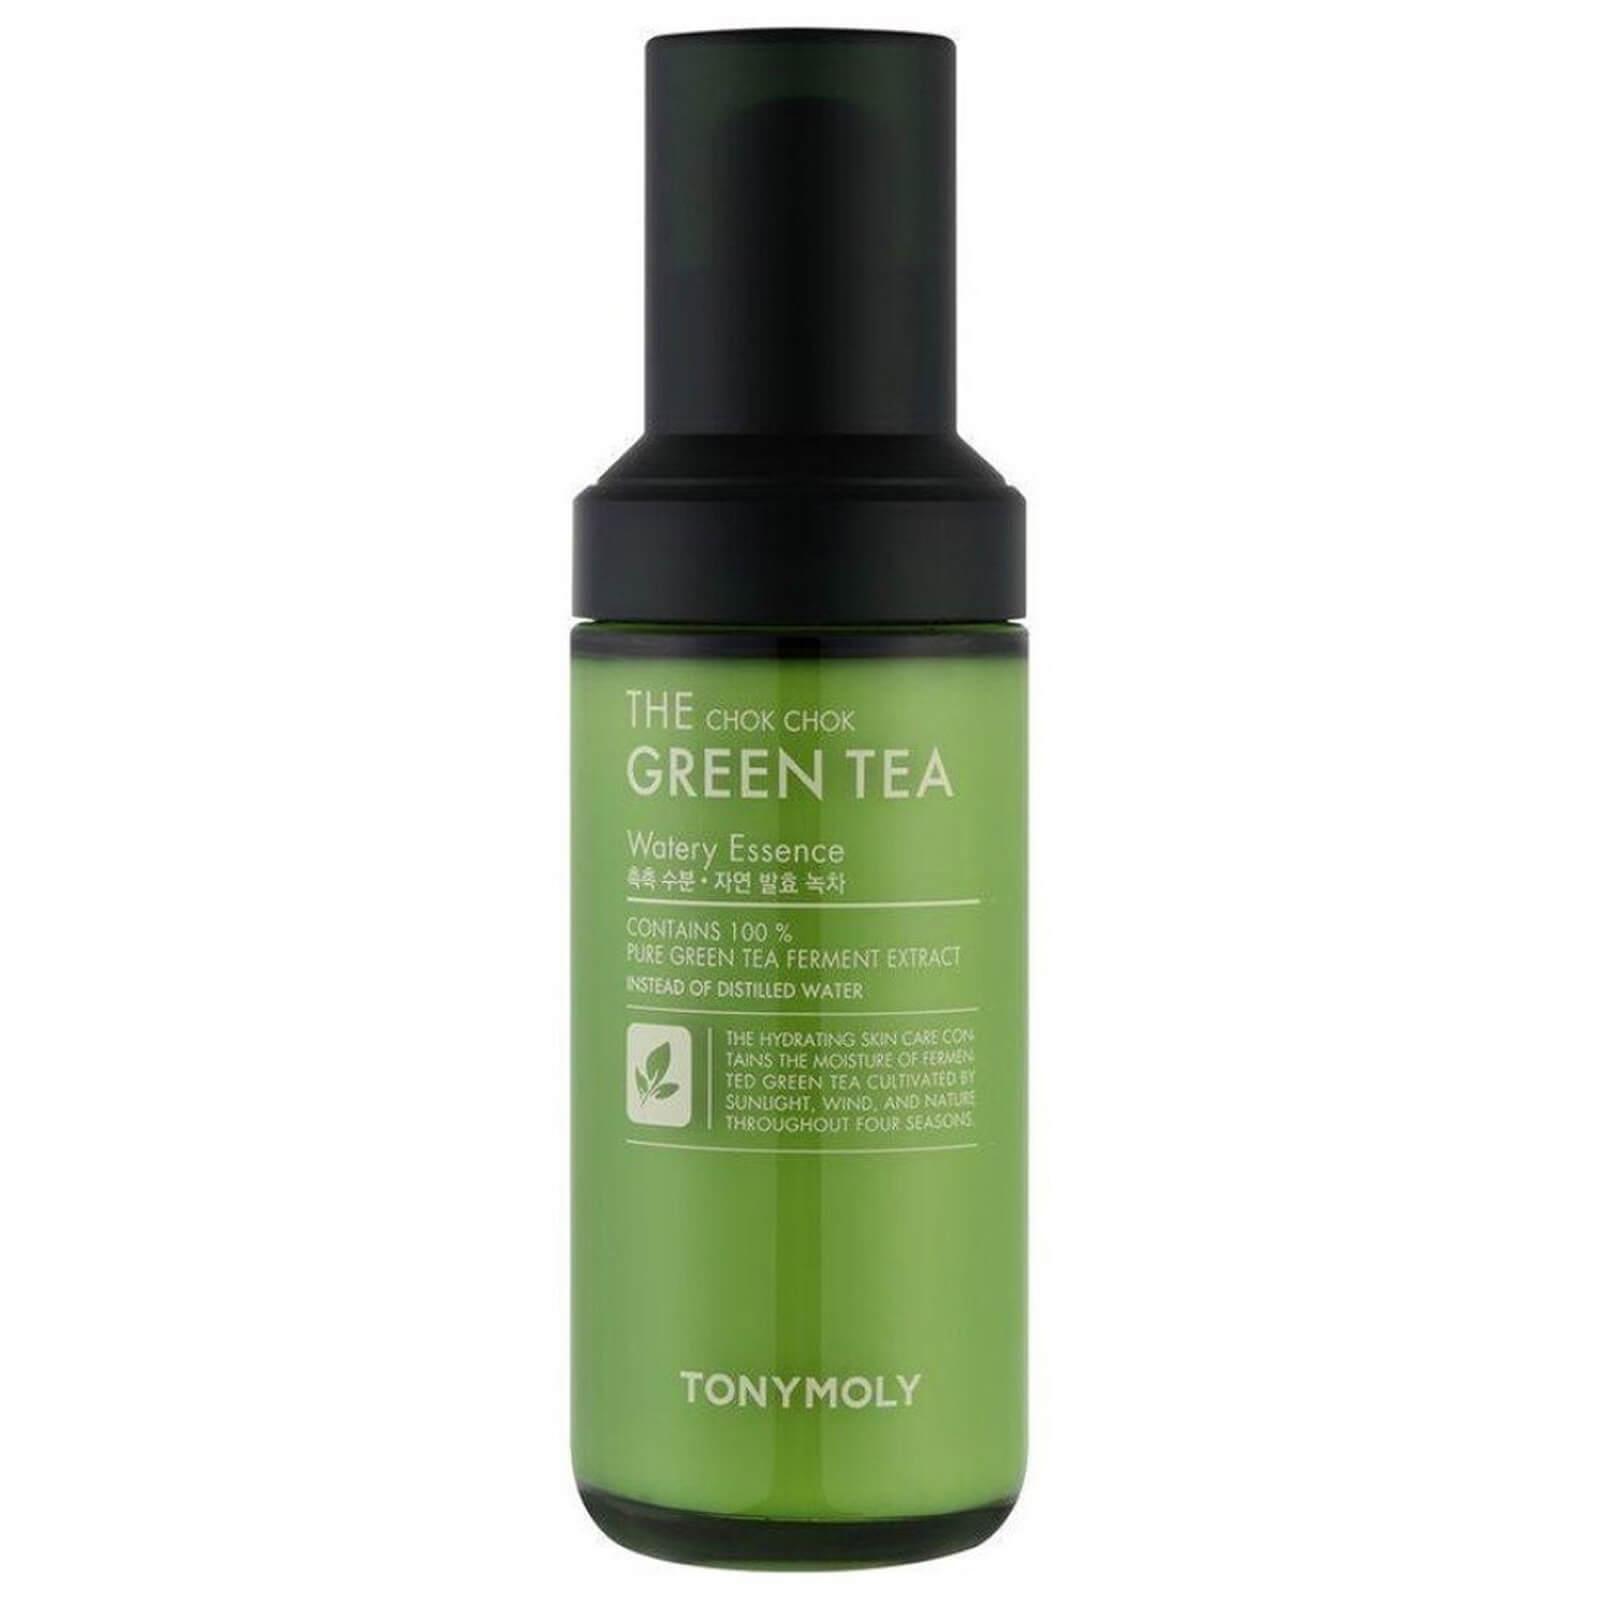 TONYMOLY The Chok Chok Green Tea Watery Essence 55ml